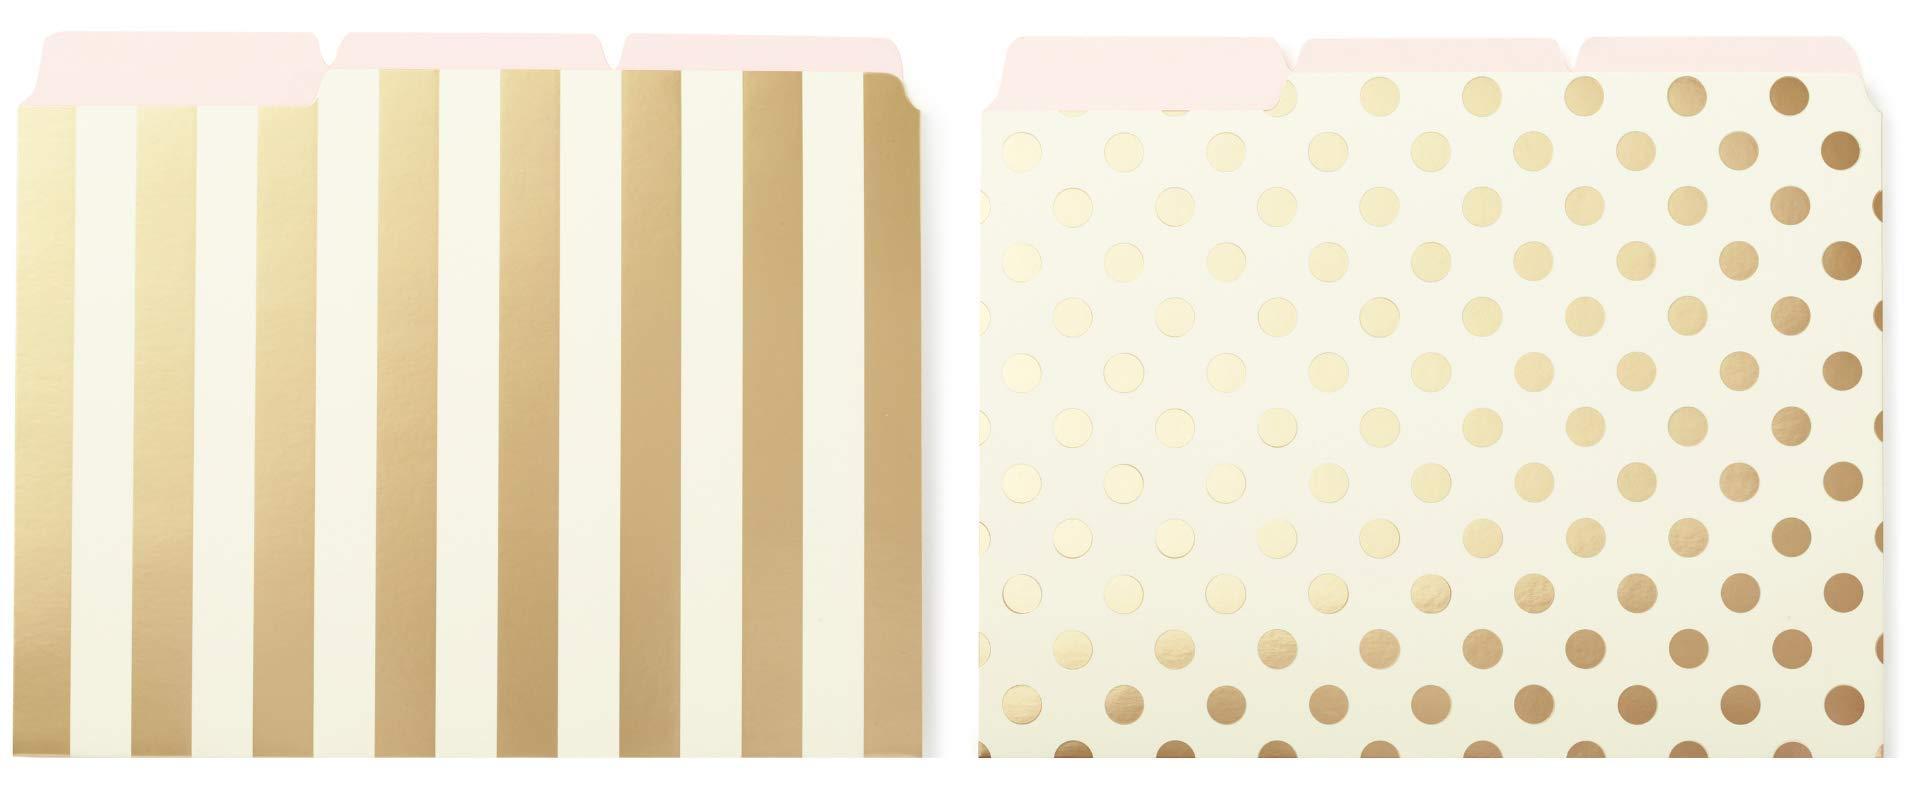 Bundle - Kate Spade New York File Folders Gold Stripe Set of 6 and Gold Dot Set of 6 by Kate Spade New York